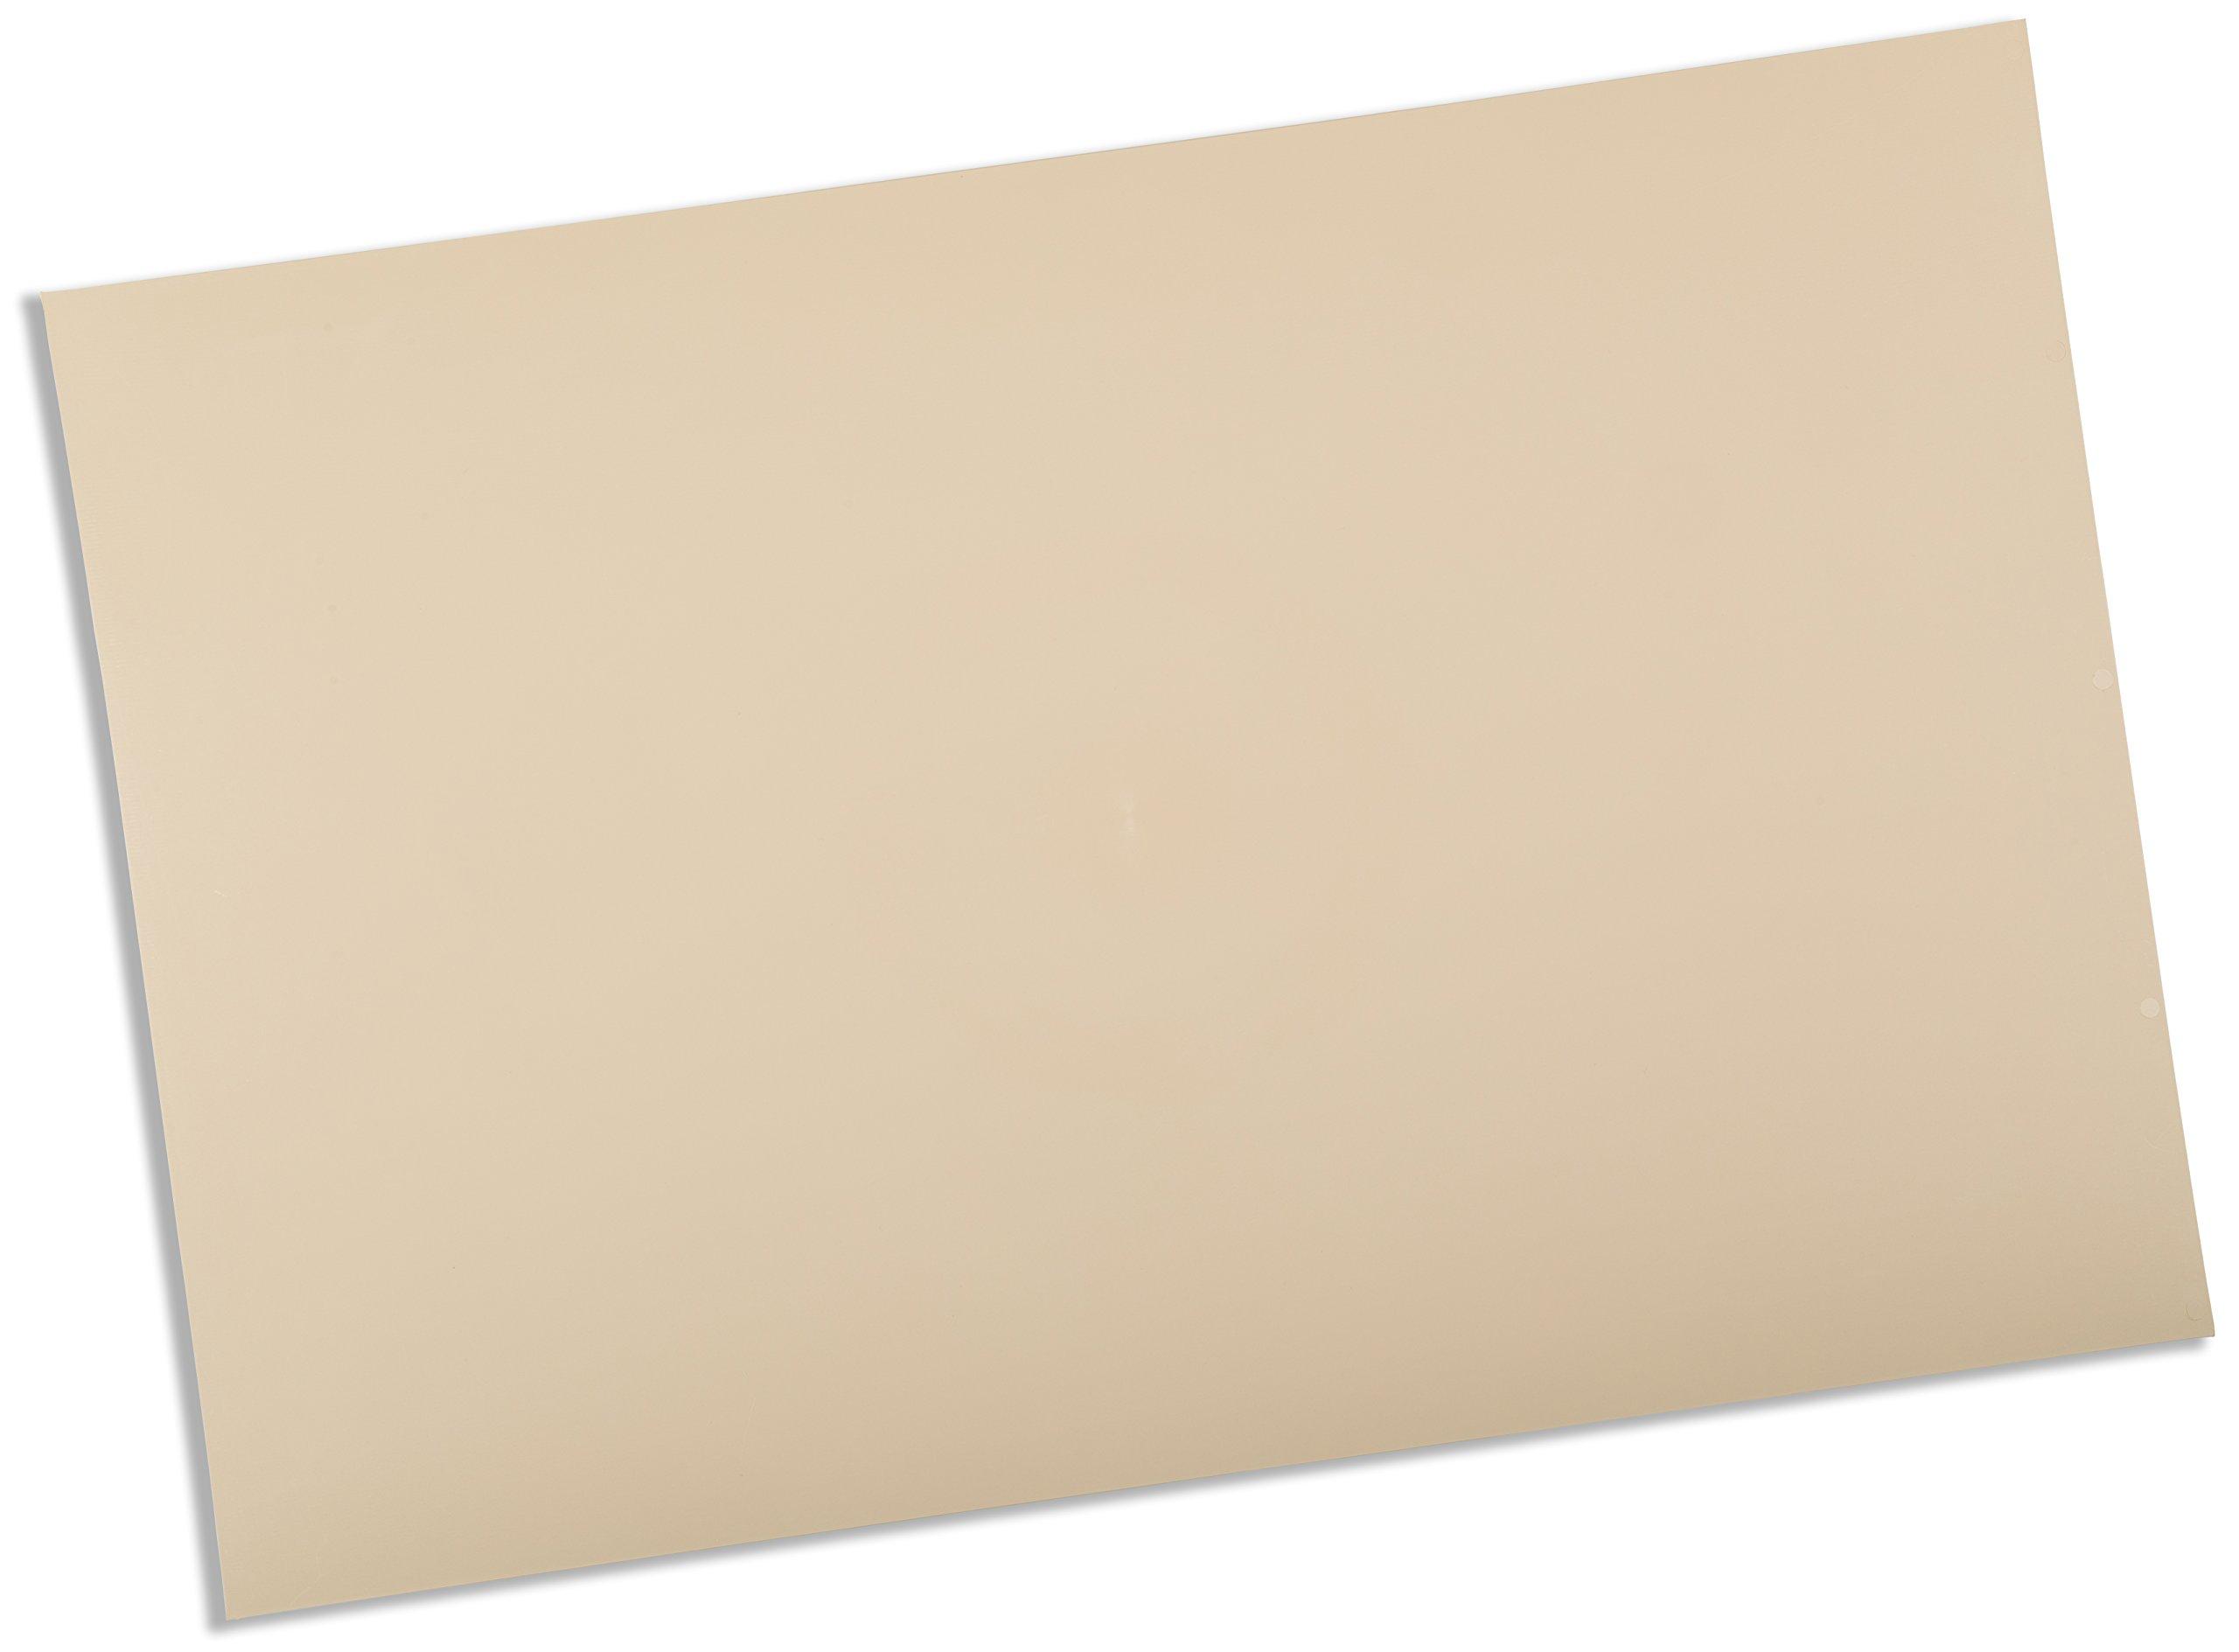 Rolyan Splinting Material Sheet, Ezeform, Beige, 1/8'' x 24'' x 36'', Solid, Single Sheet